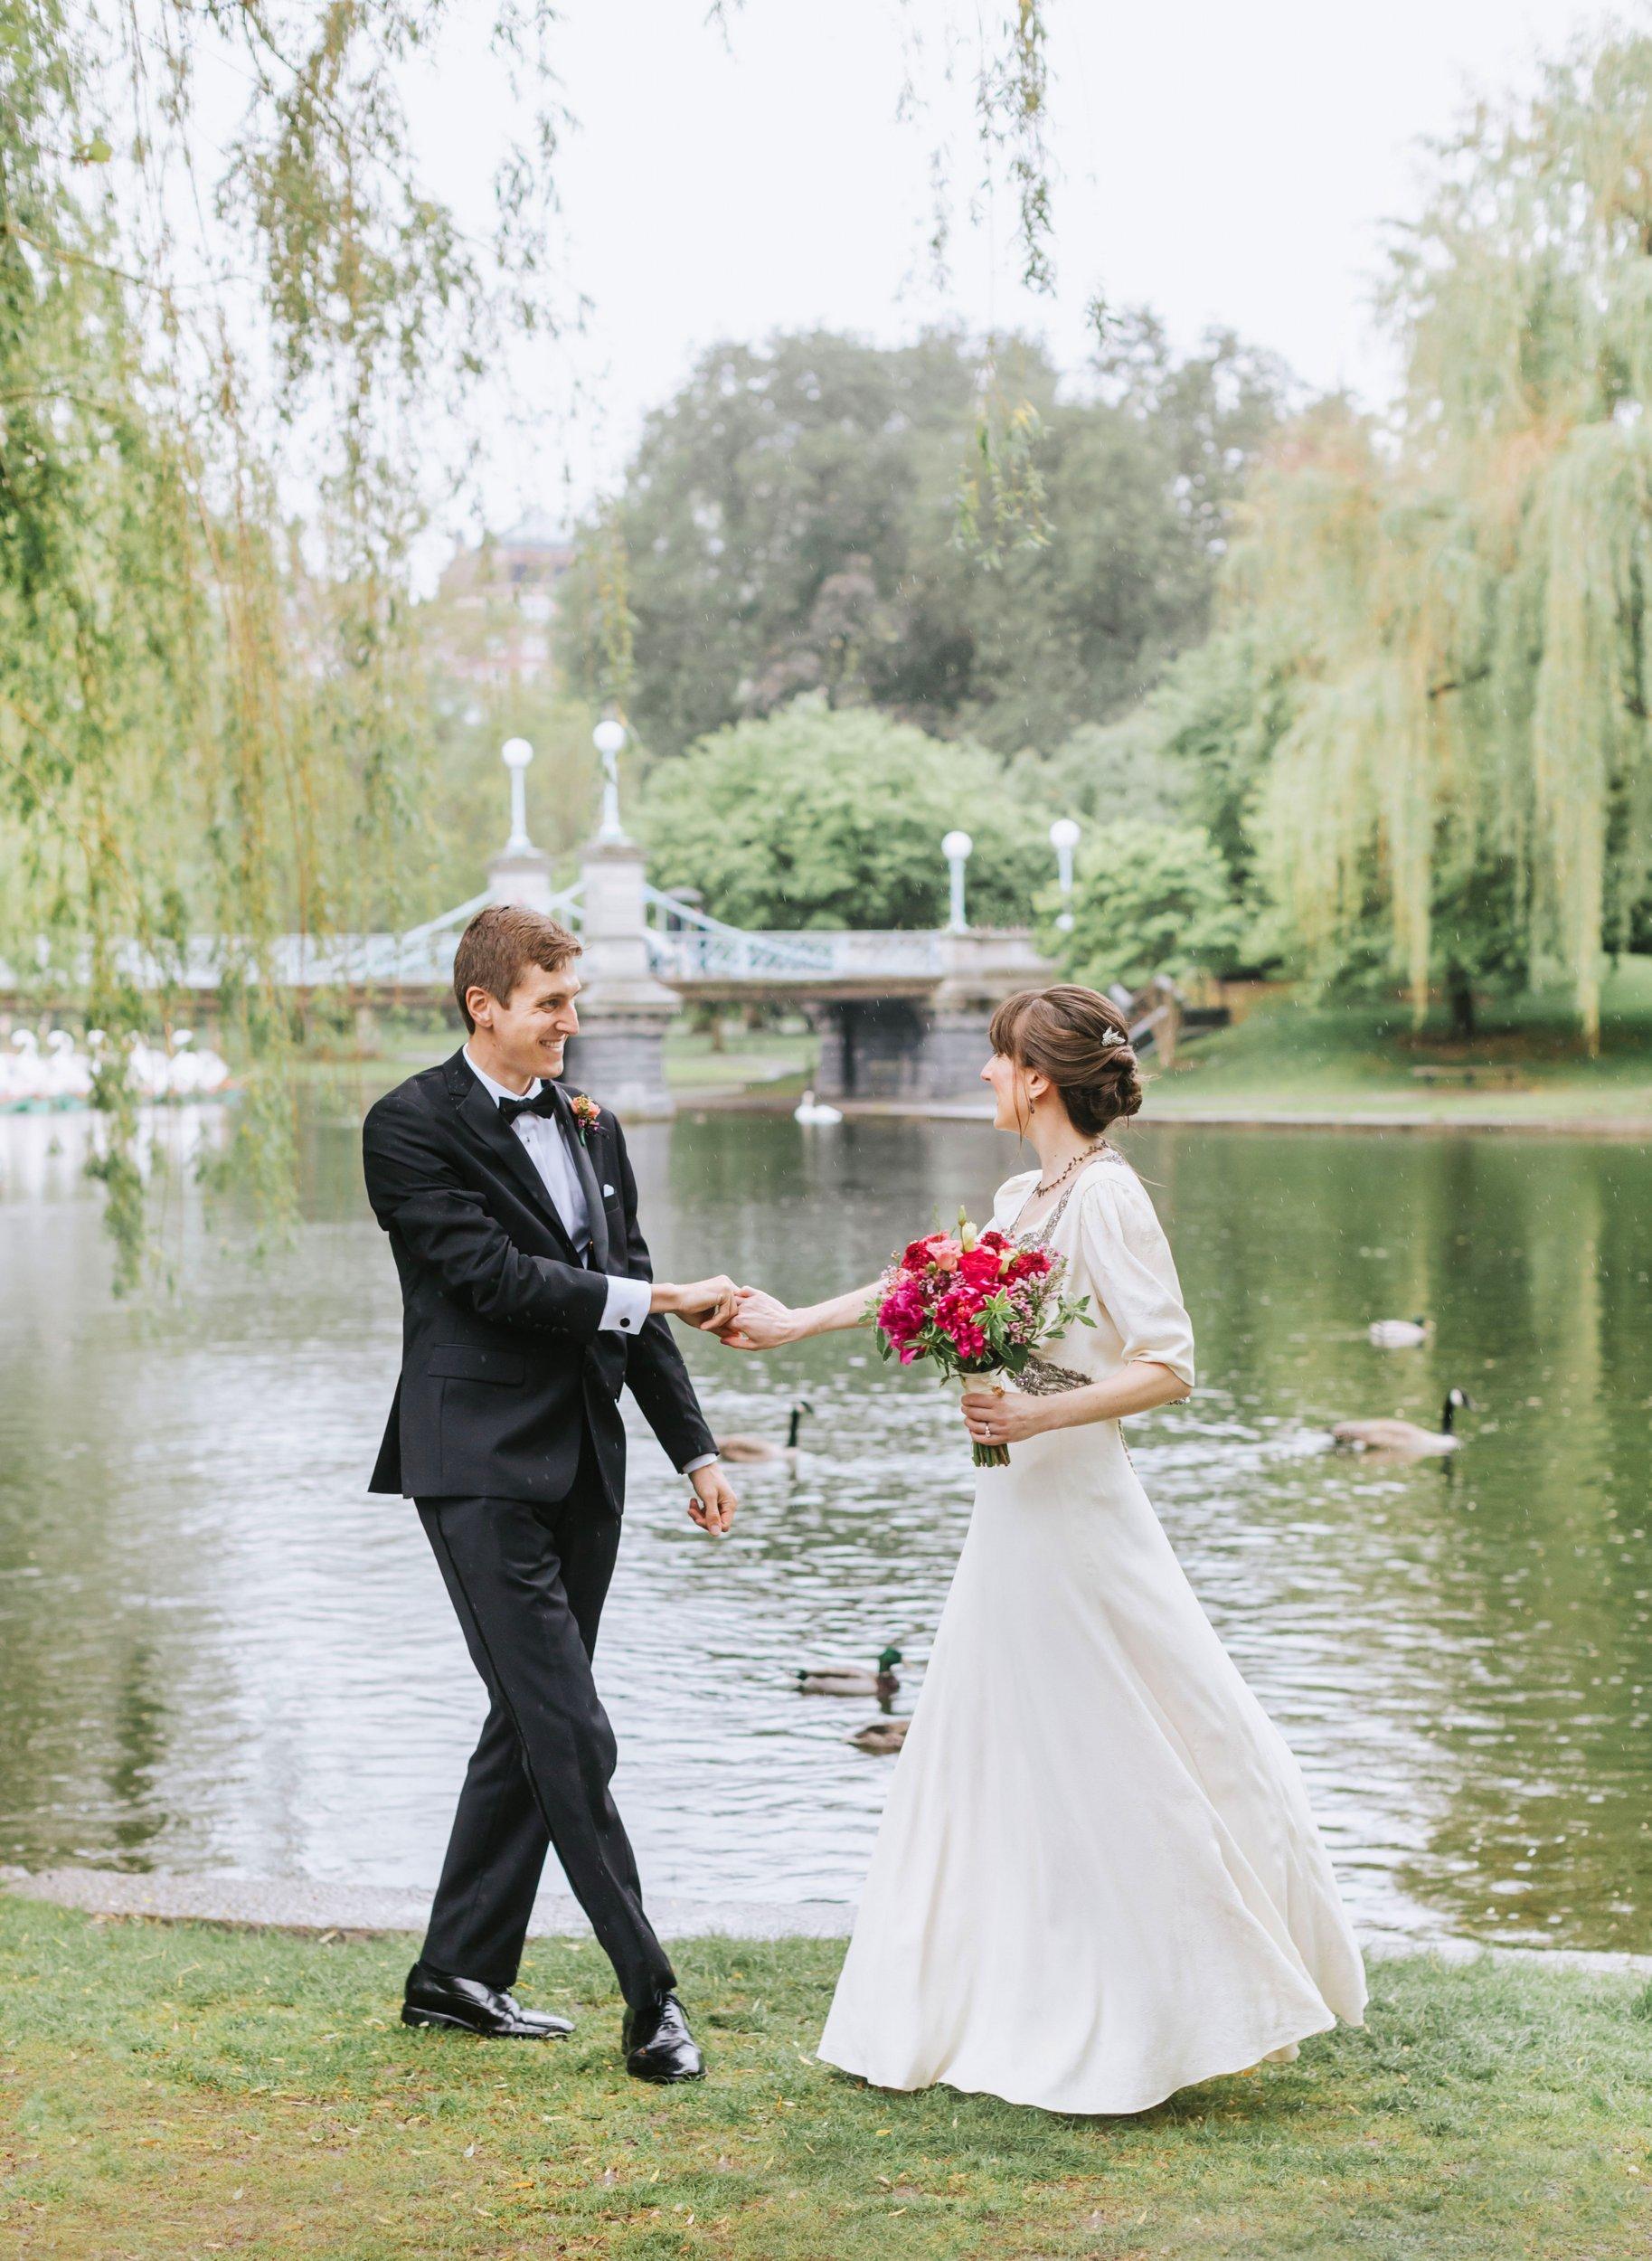 Boston-Public-Garden-Wedding-Vintage-Lena-Mirisola-7.JPG